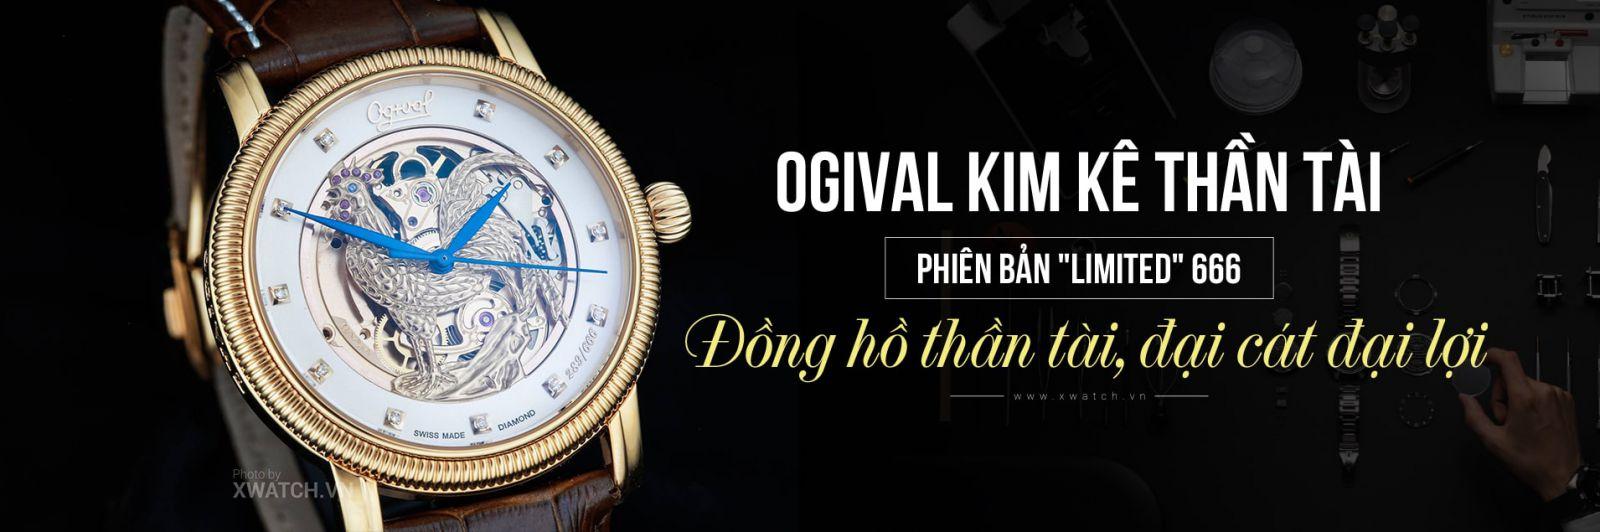 Đồng hồ Ogival Kim Kê Thần Tài OG358.37AGR-GL